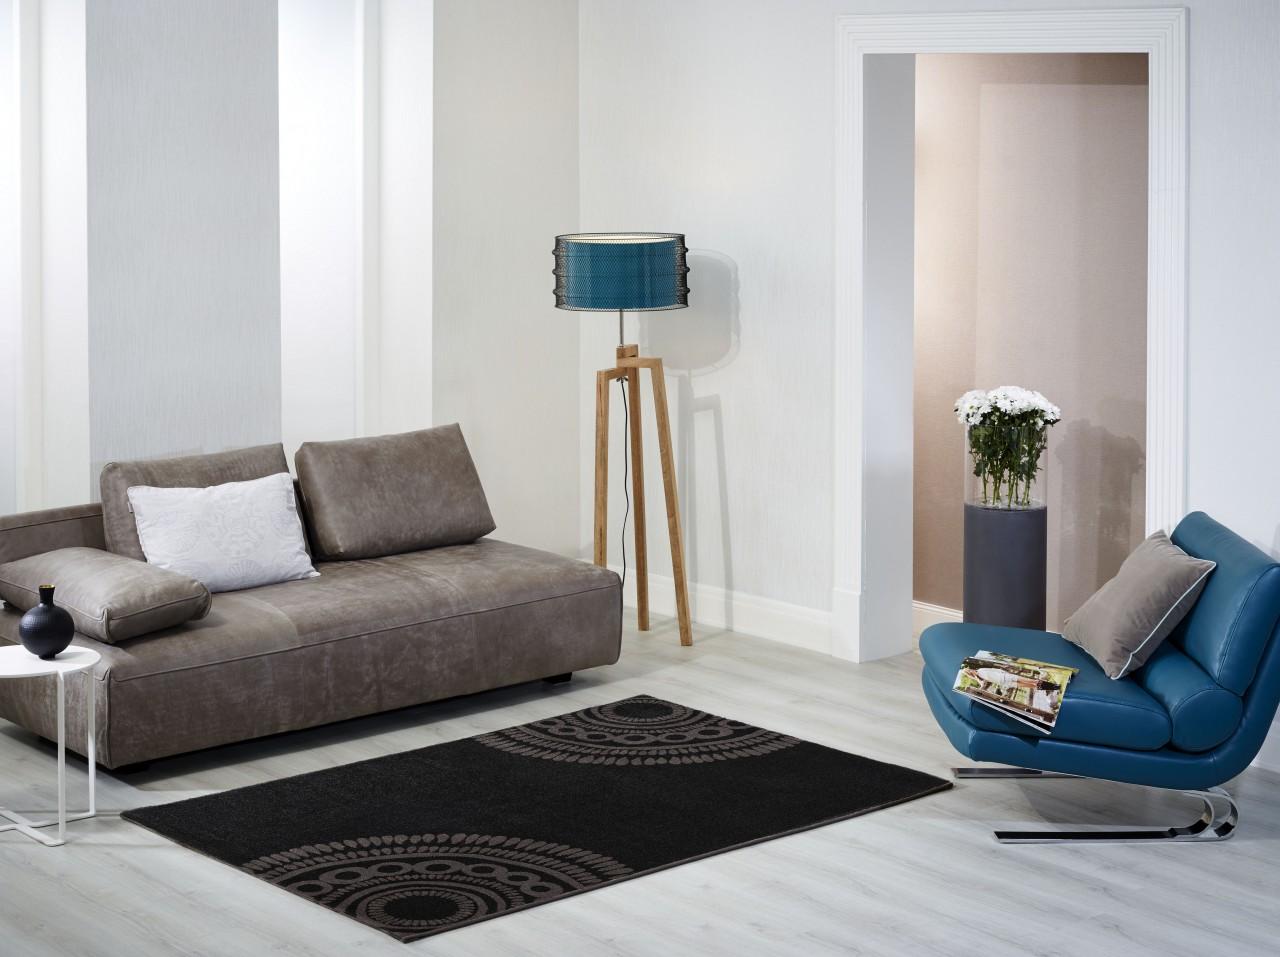 designer teppich barbara becker balance anthrazit teppiche. Black Bedroom Furniture Sets. Home Design Ideas